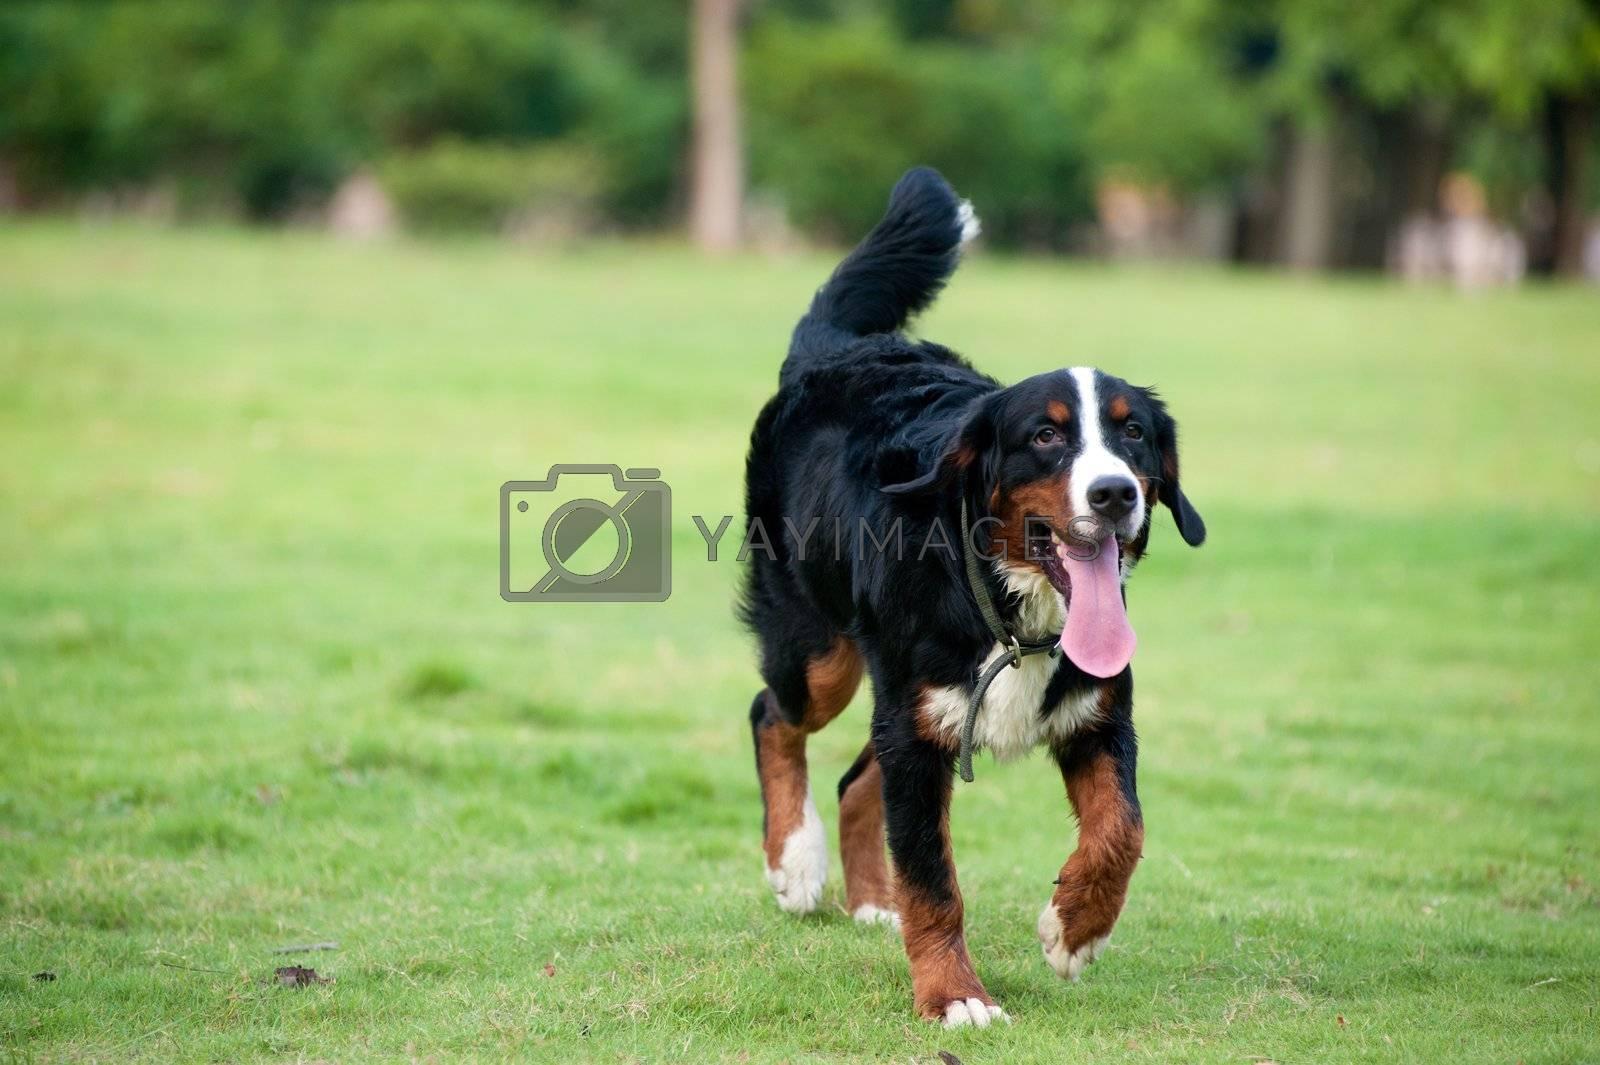 Bernese mountain dog walking on the lawn